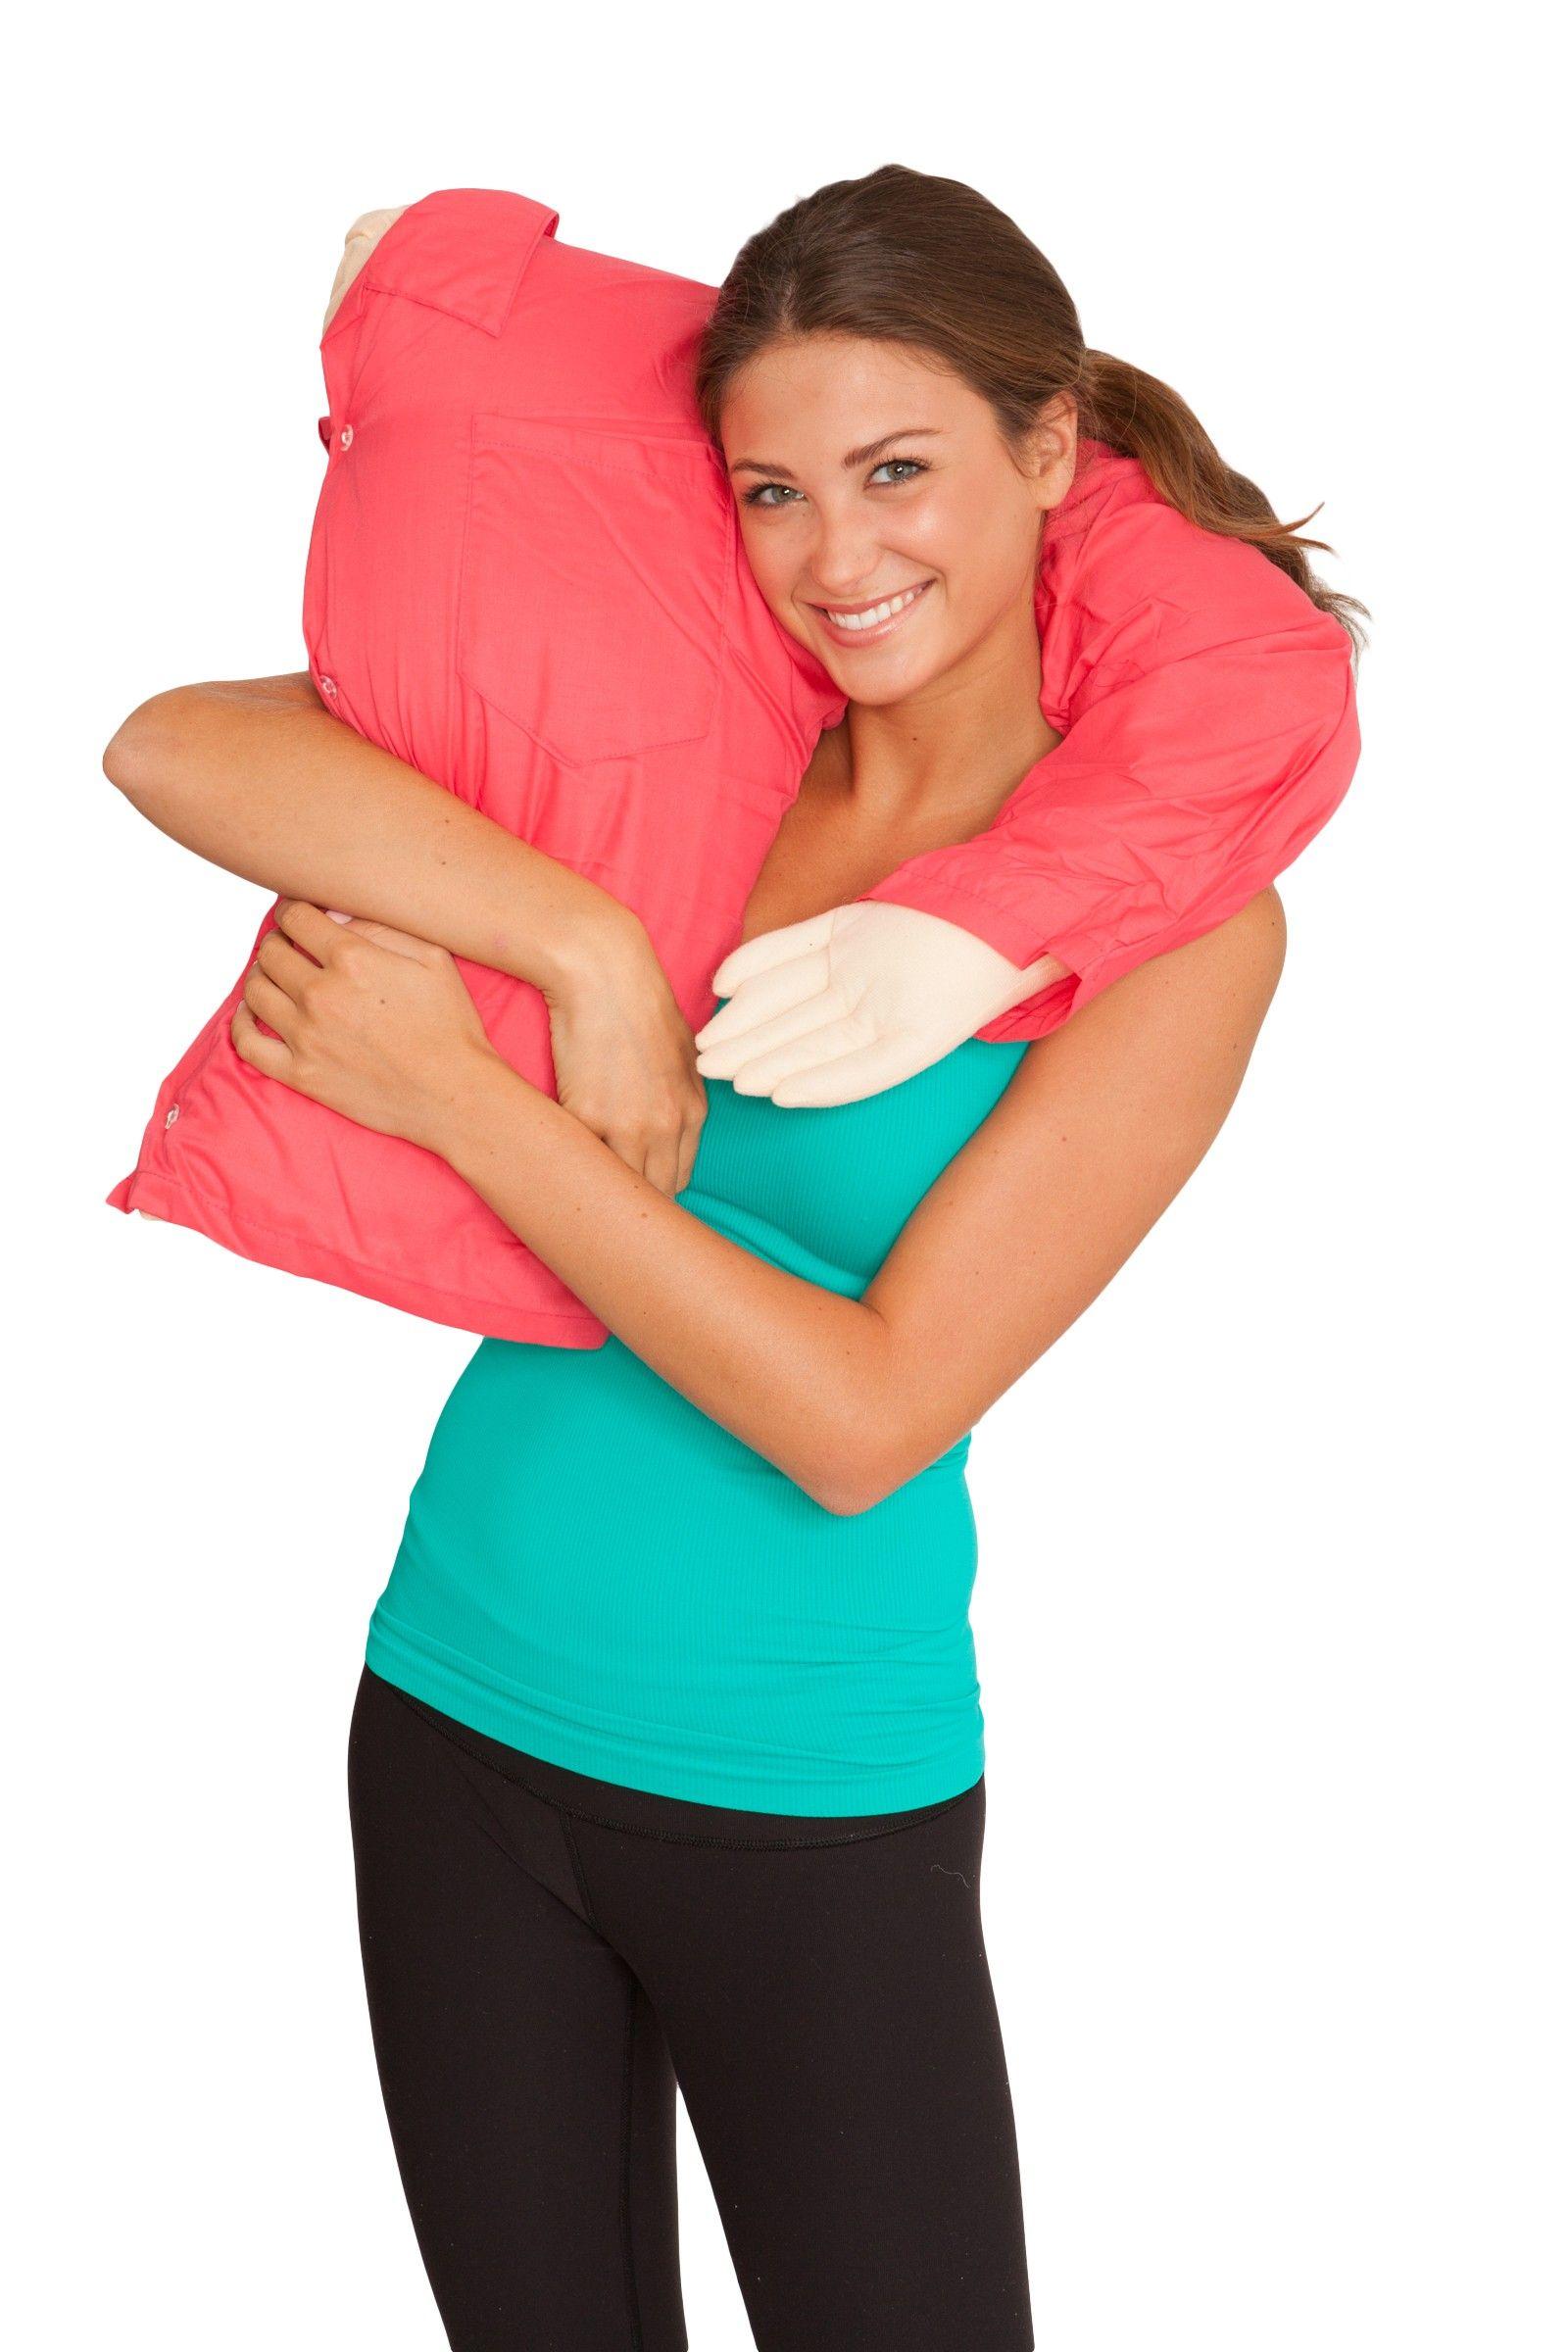 Missing your partner hereus the answer boyfriend pillow